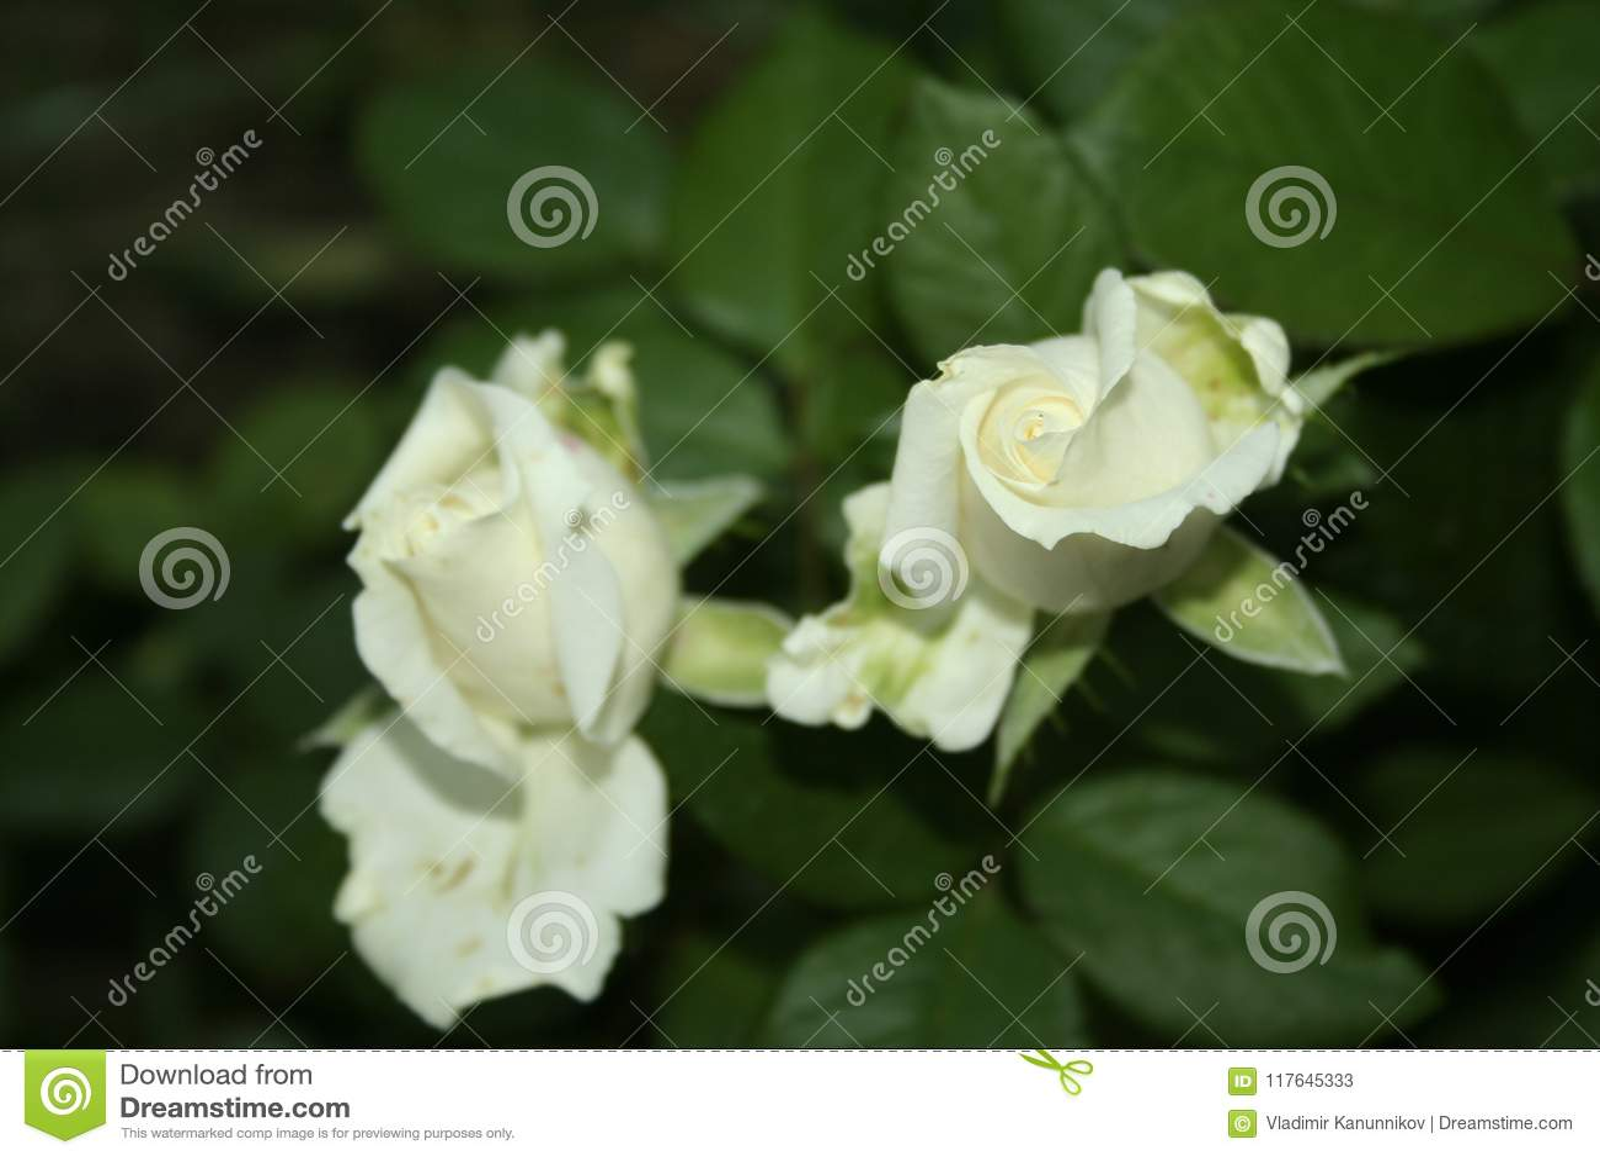 Little White Rose Flowers Stock Image Image Of Flowers 117645333